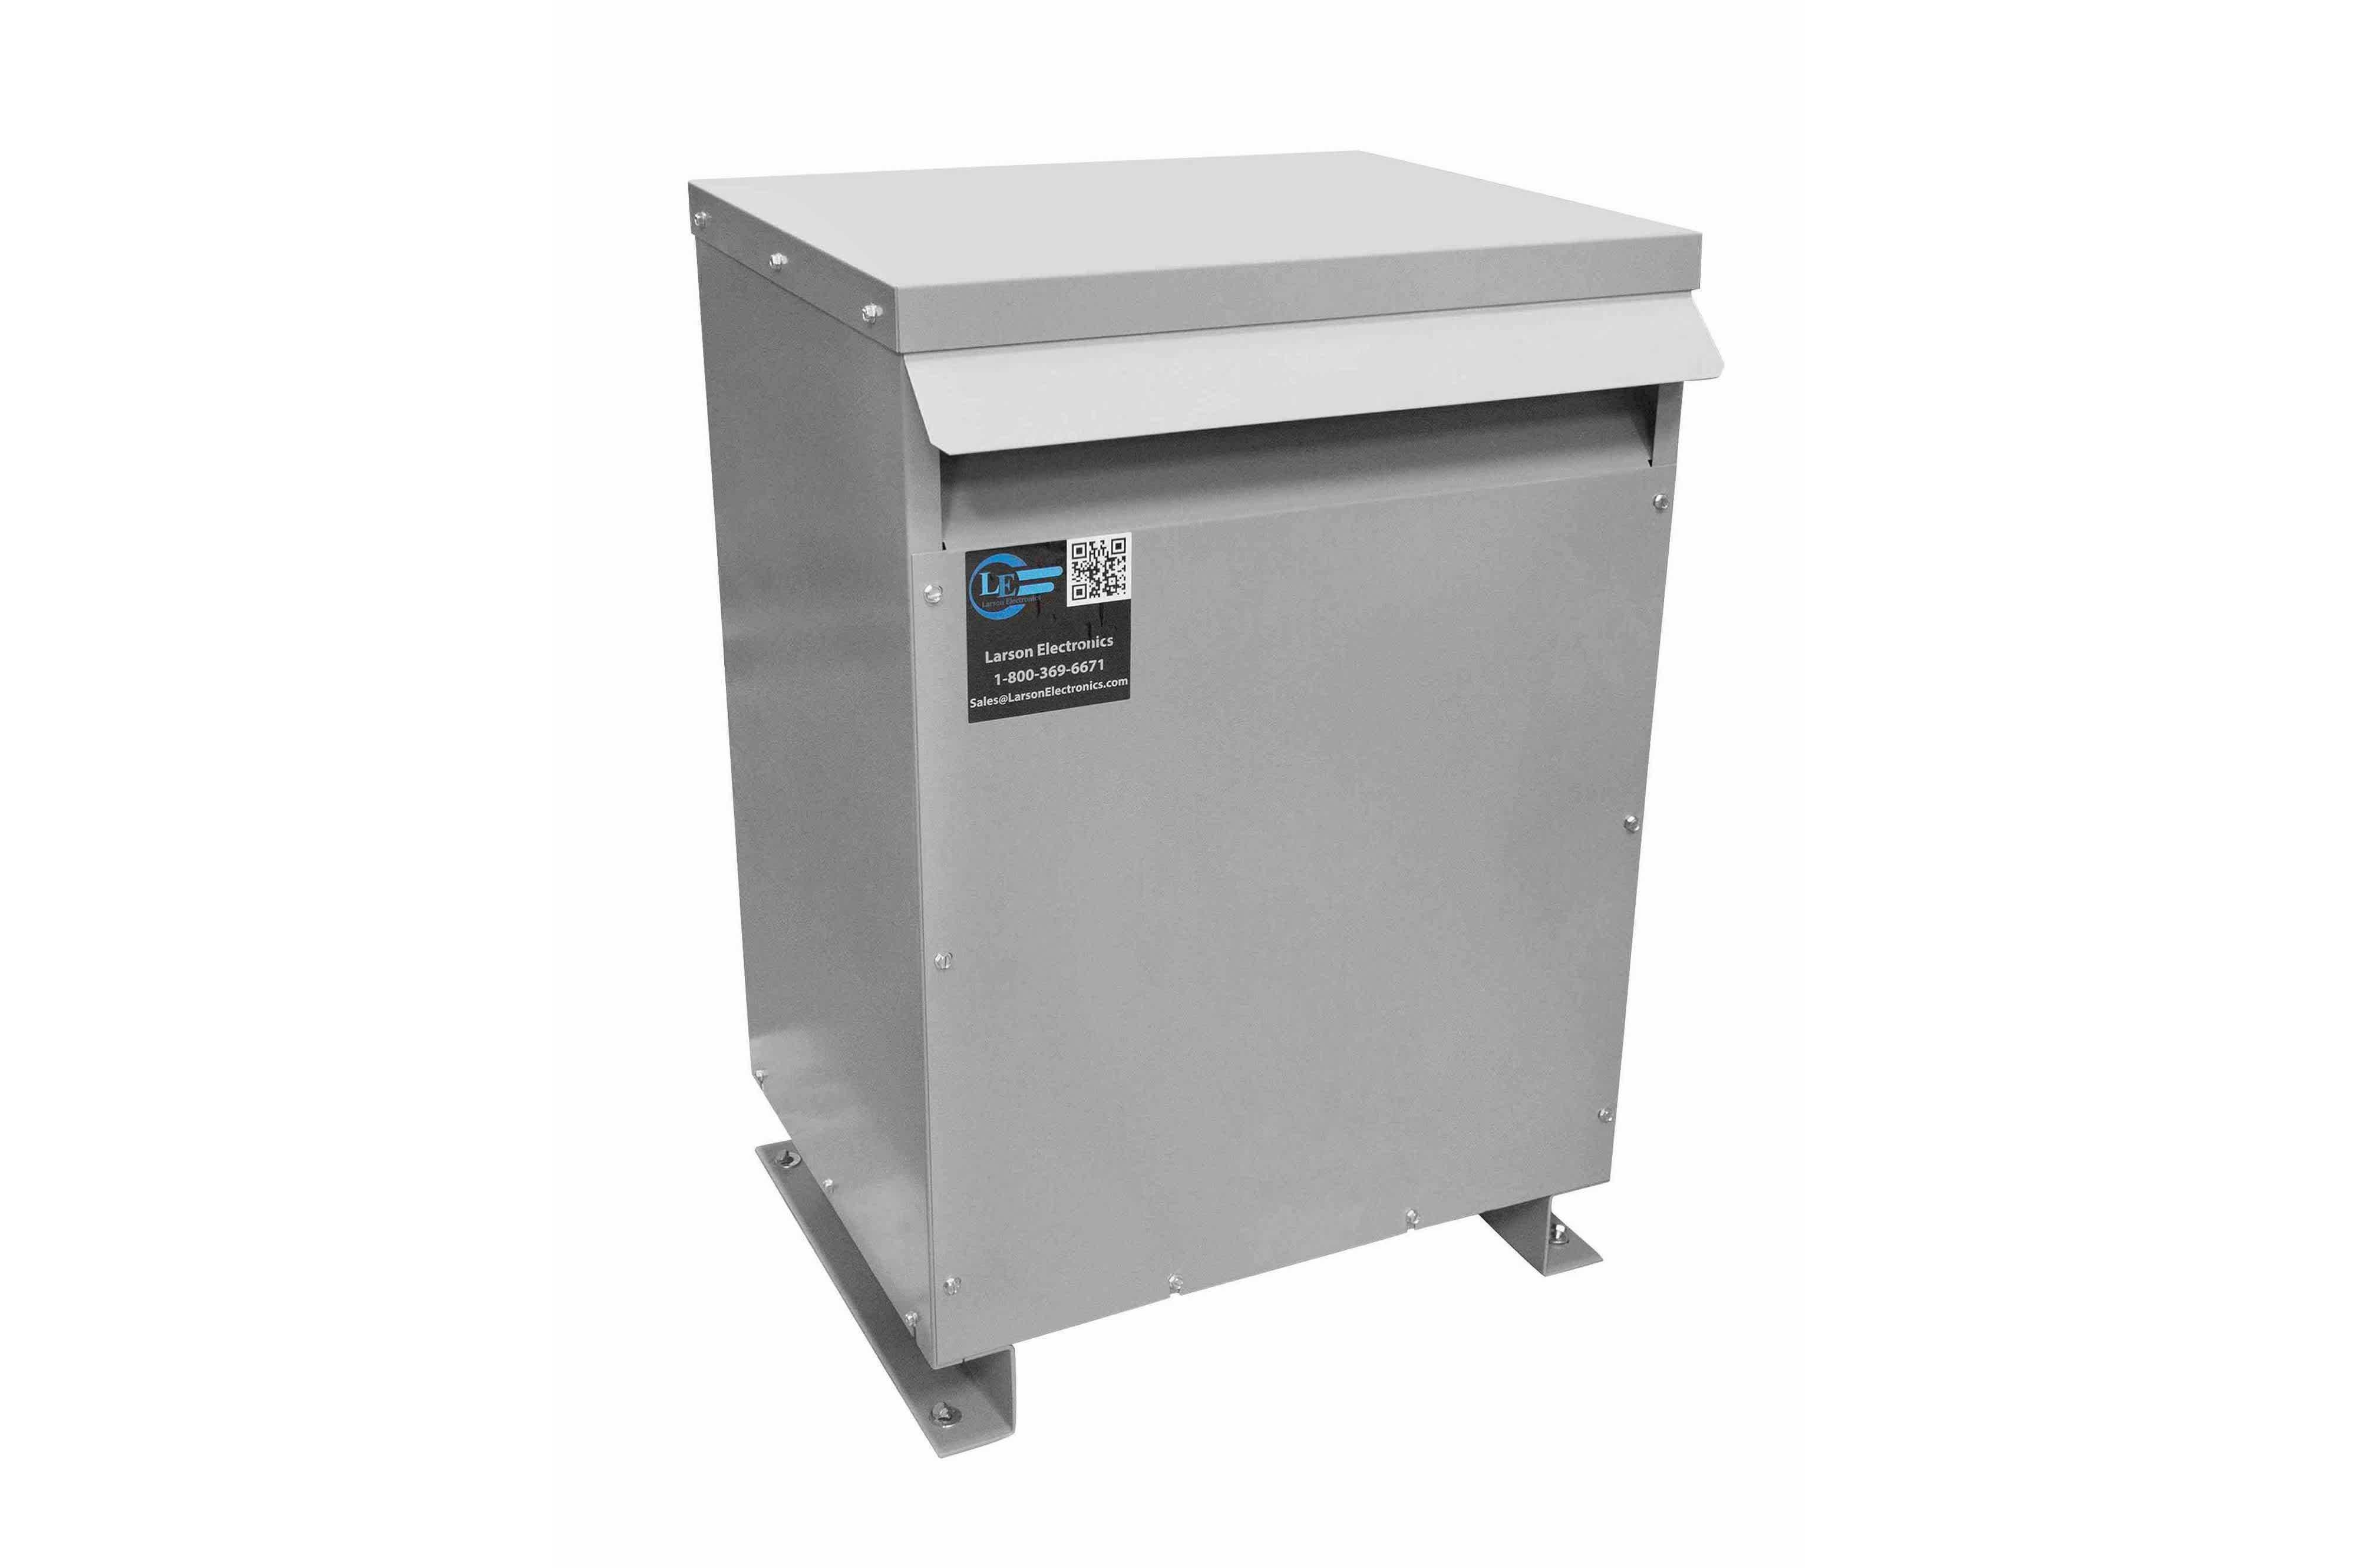 500 kVA 3PH DOE Transformer, 415V Delta Primary, 480Y/277 Wye-N Secondary, N3R, Ventilated, 60 Hz